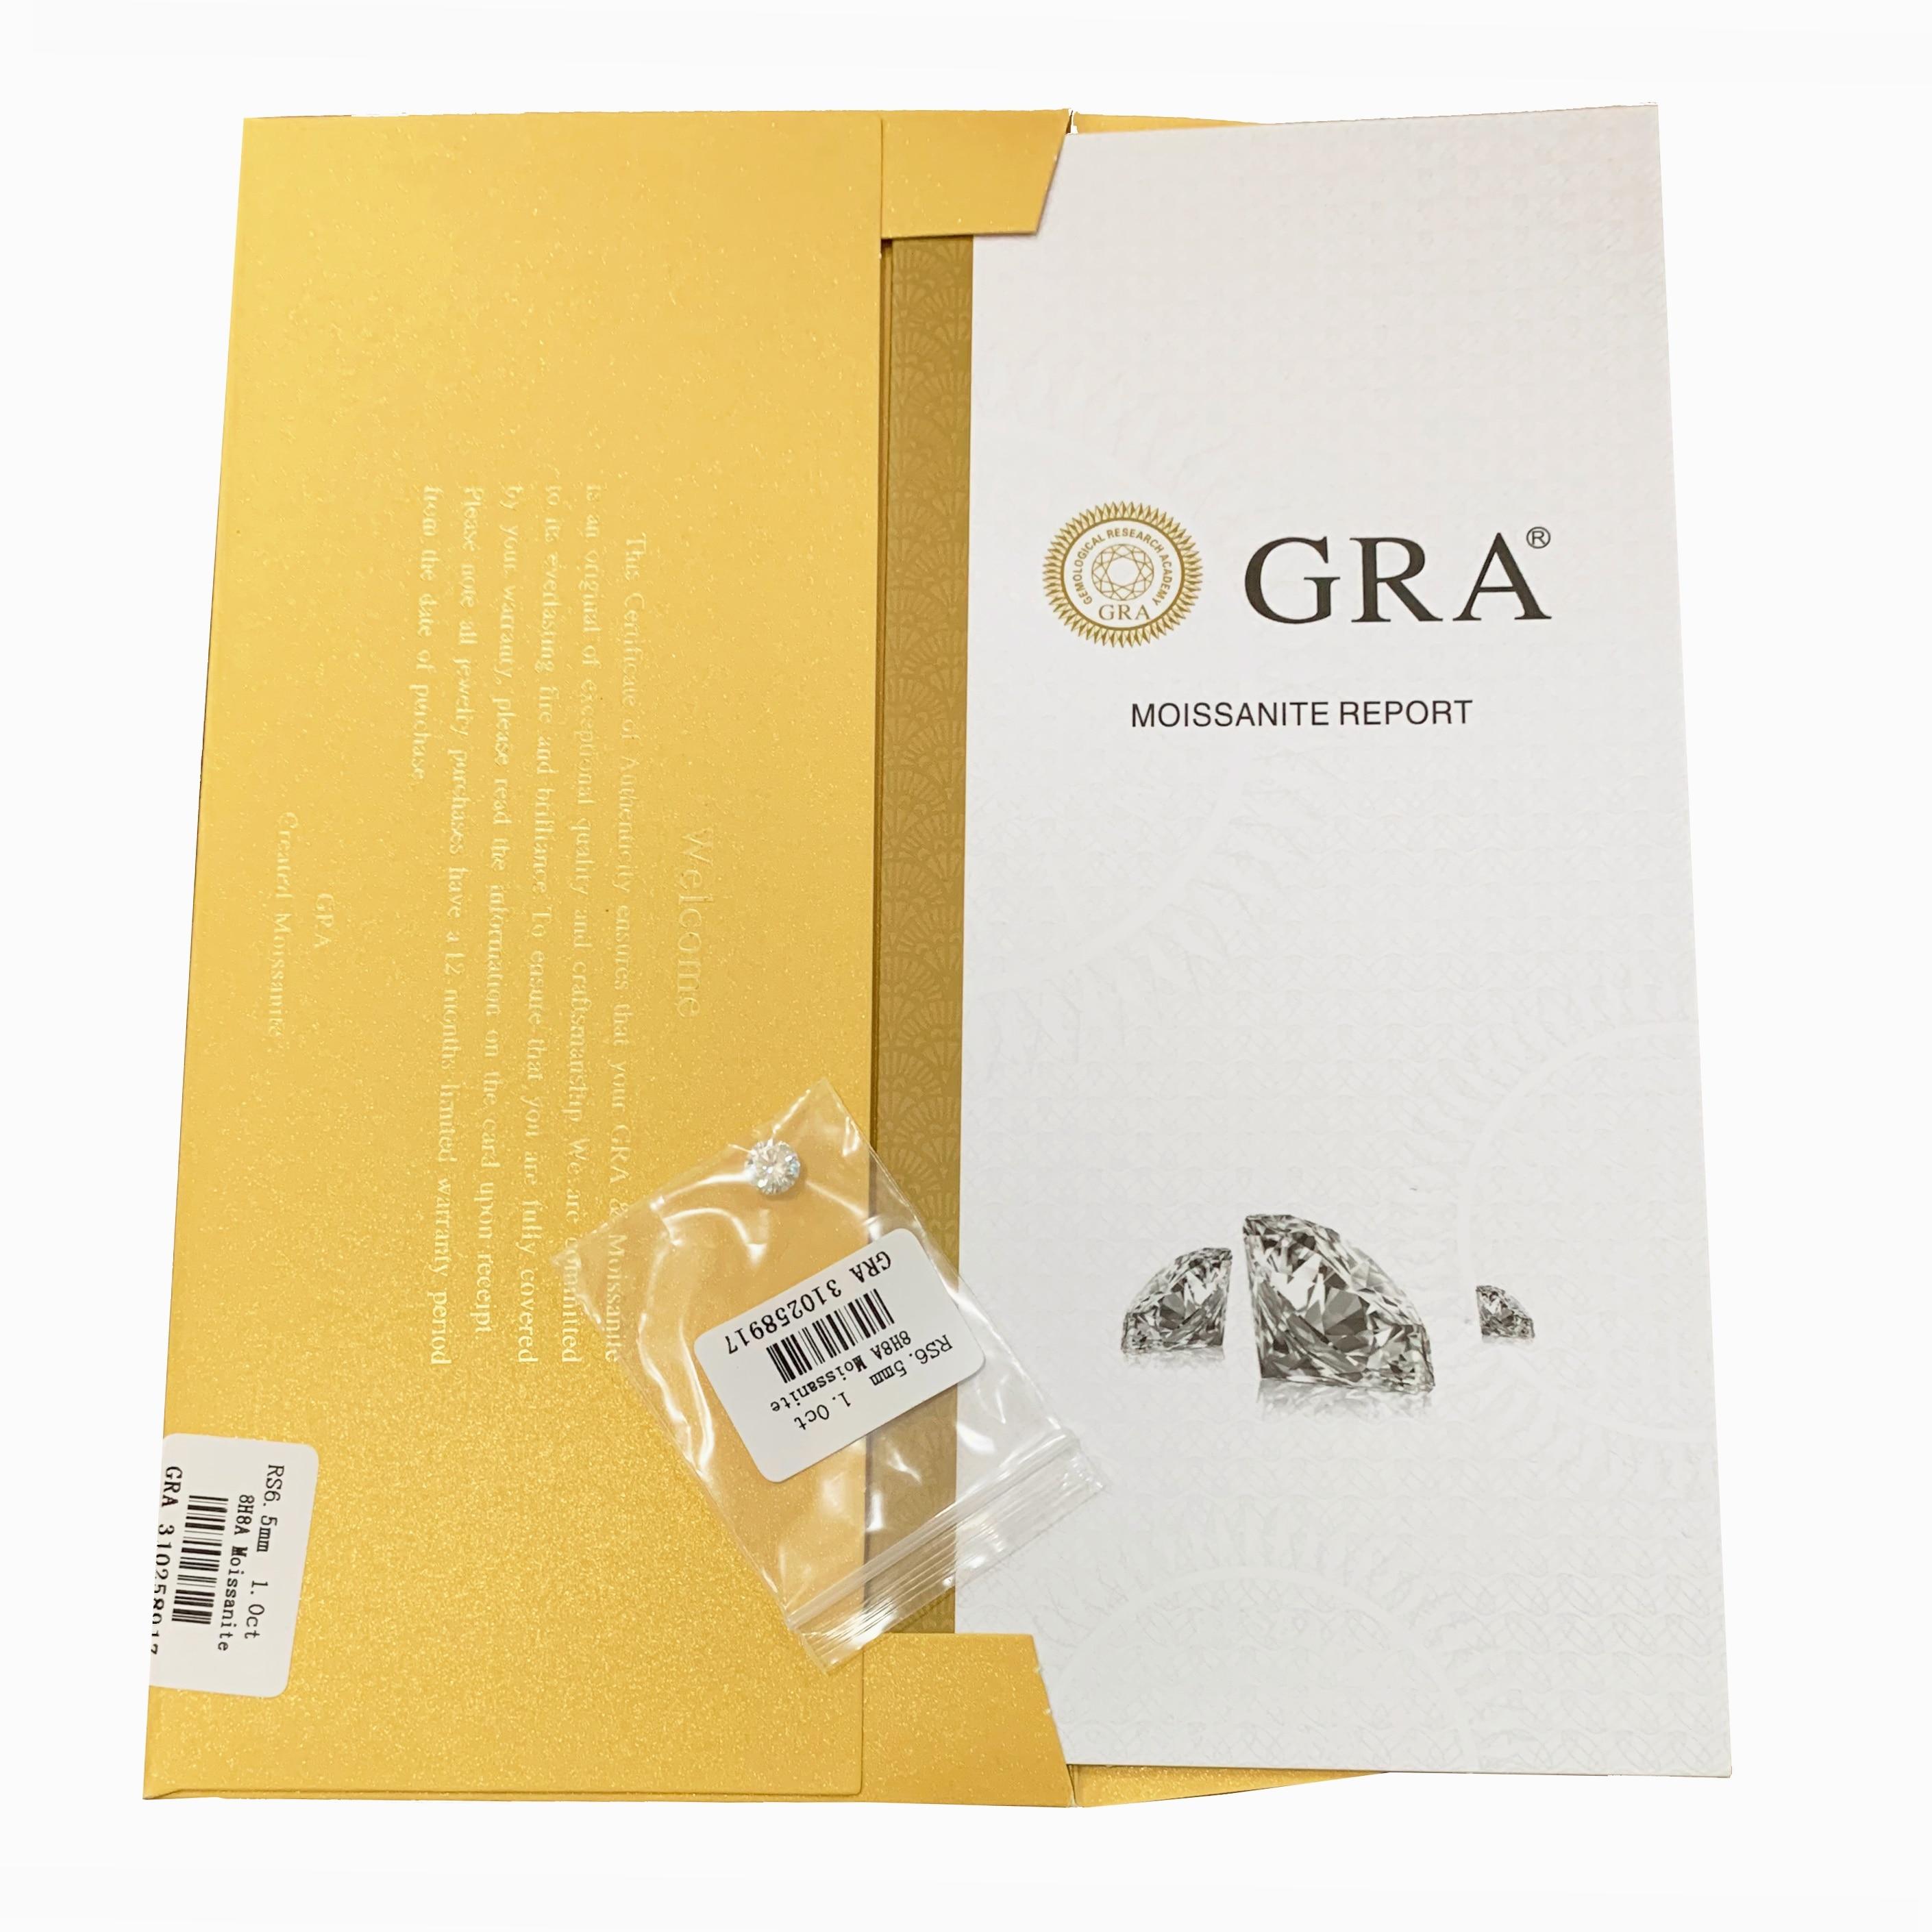 1ct Carat 6.5mm D Color loose moissanite Hearts and Arrows Round cut Lab Grown Diamond Loose Stone VVS1 Excellent Cut